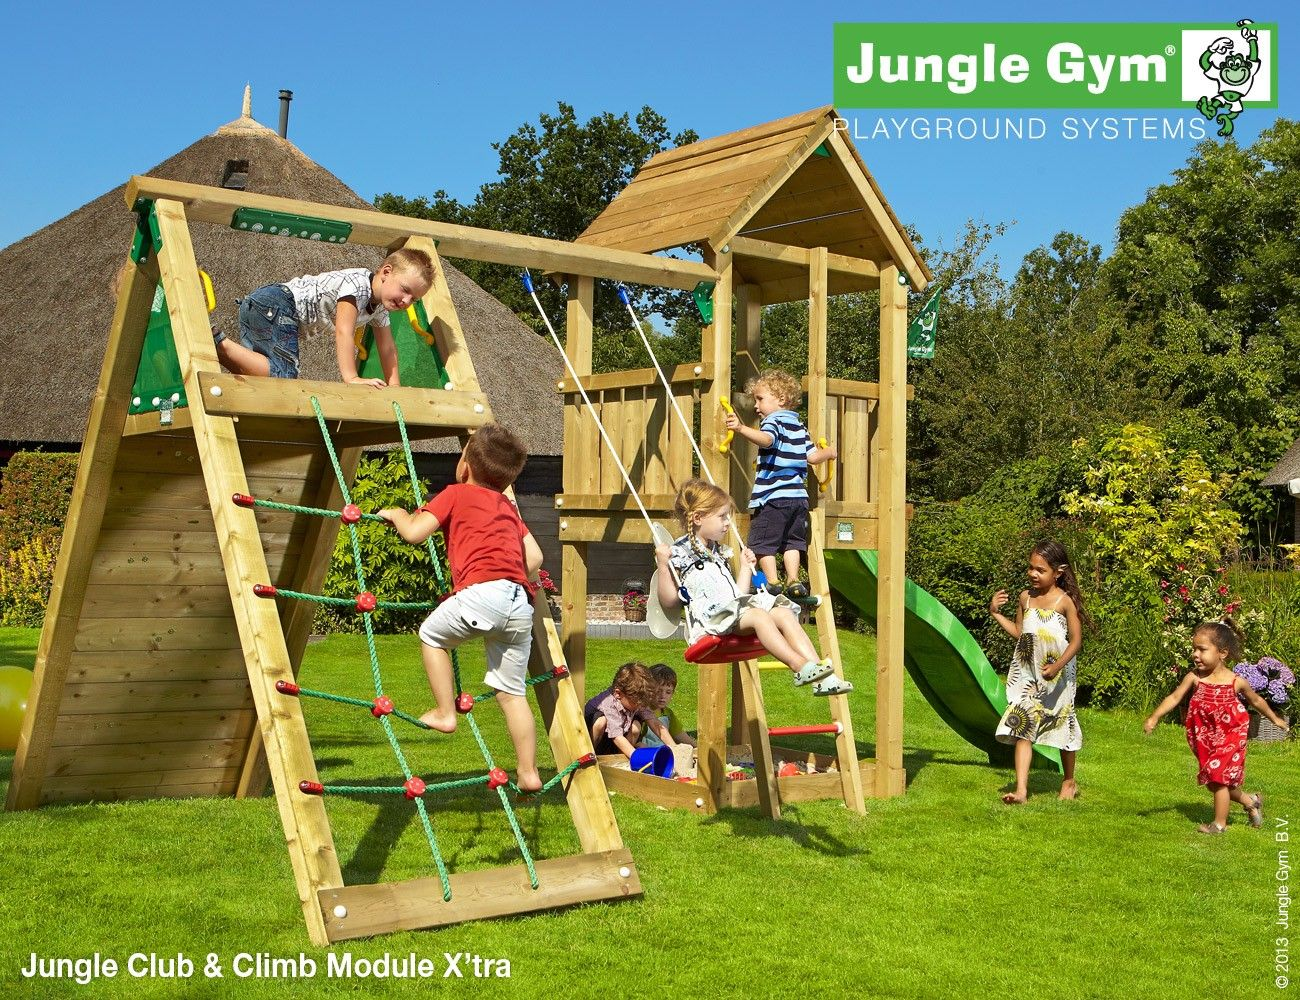 Klettergerüst Jungle Gym : Jungle club playtowers gym playsets pinterest